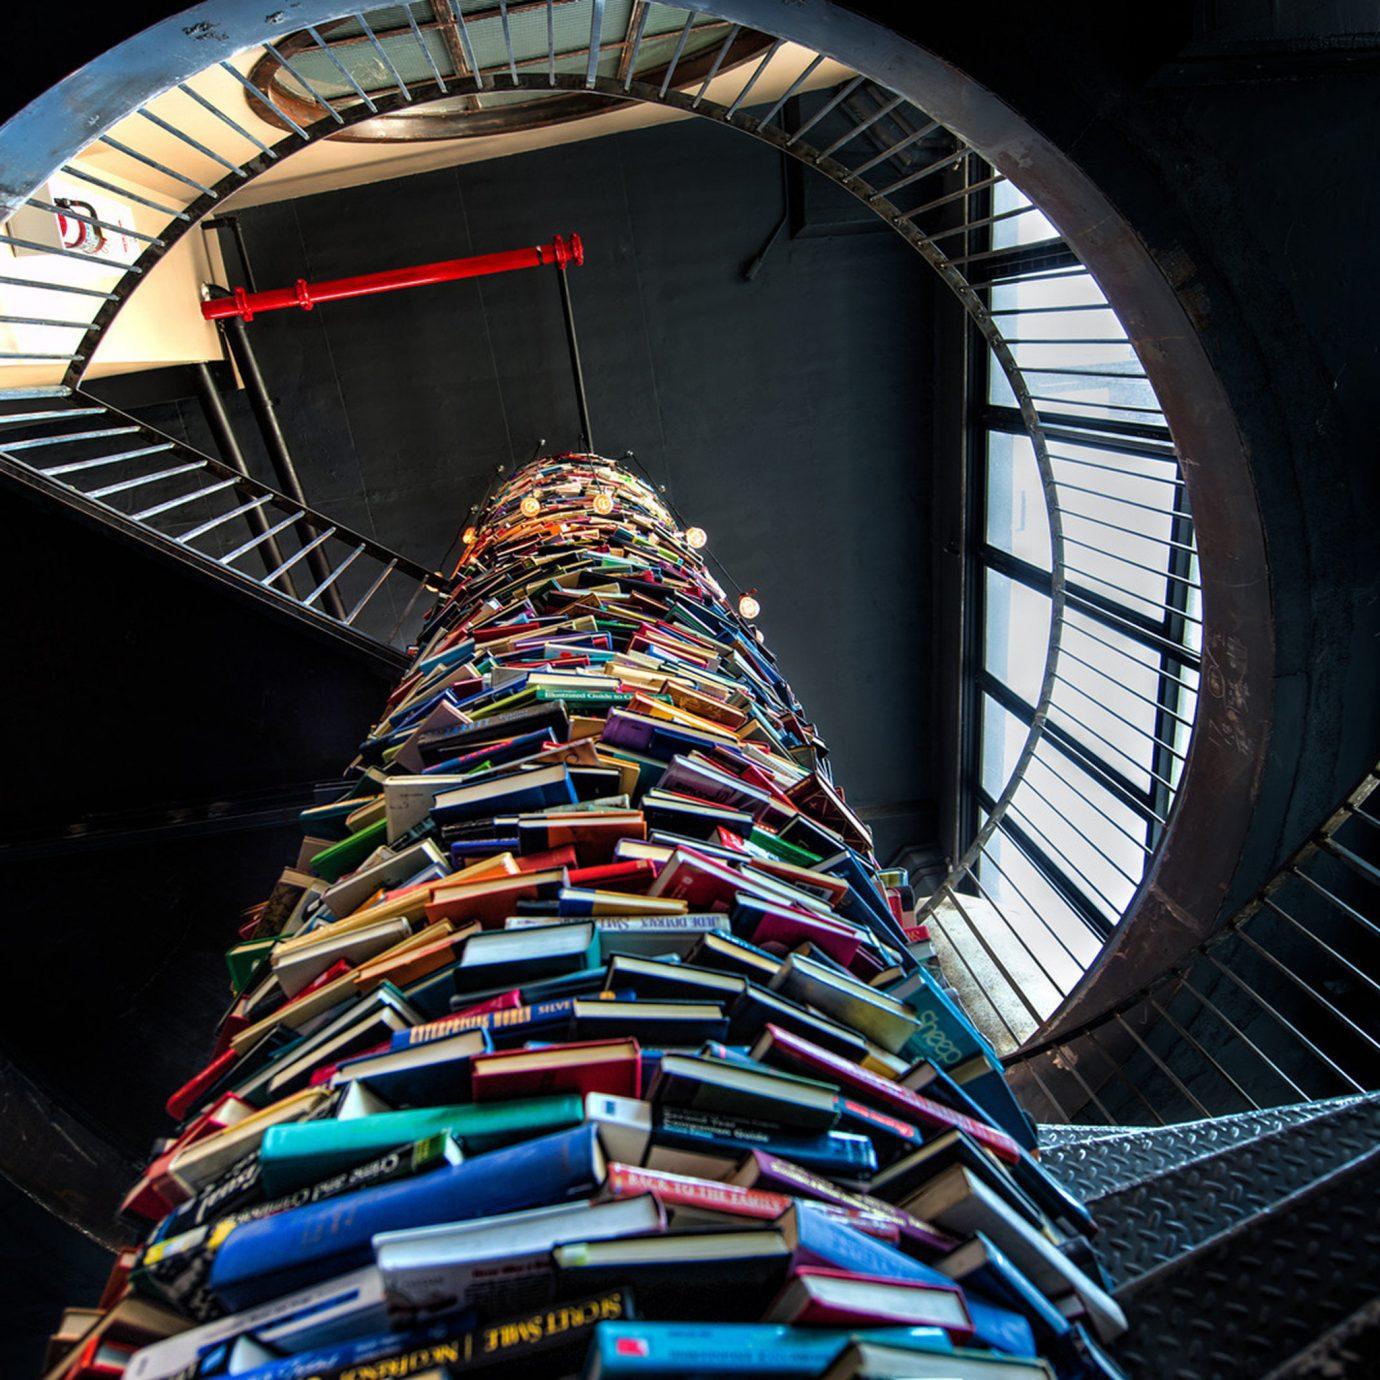 Buildings City Cultural Entertainment Hip Lobby Modern color blue light wheel skyscraper fisheye lens ferris wheel